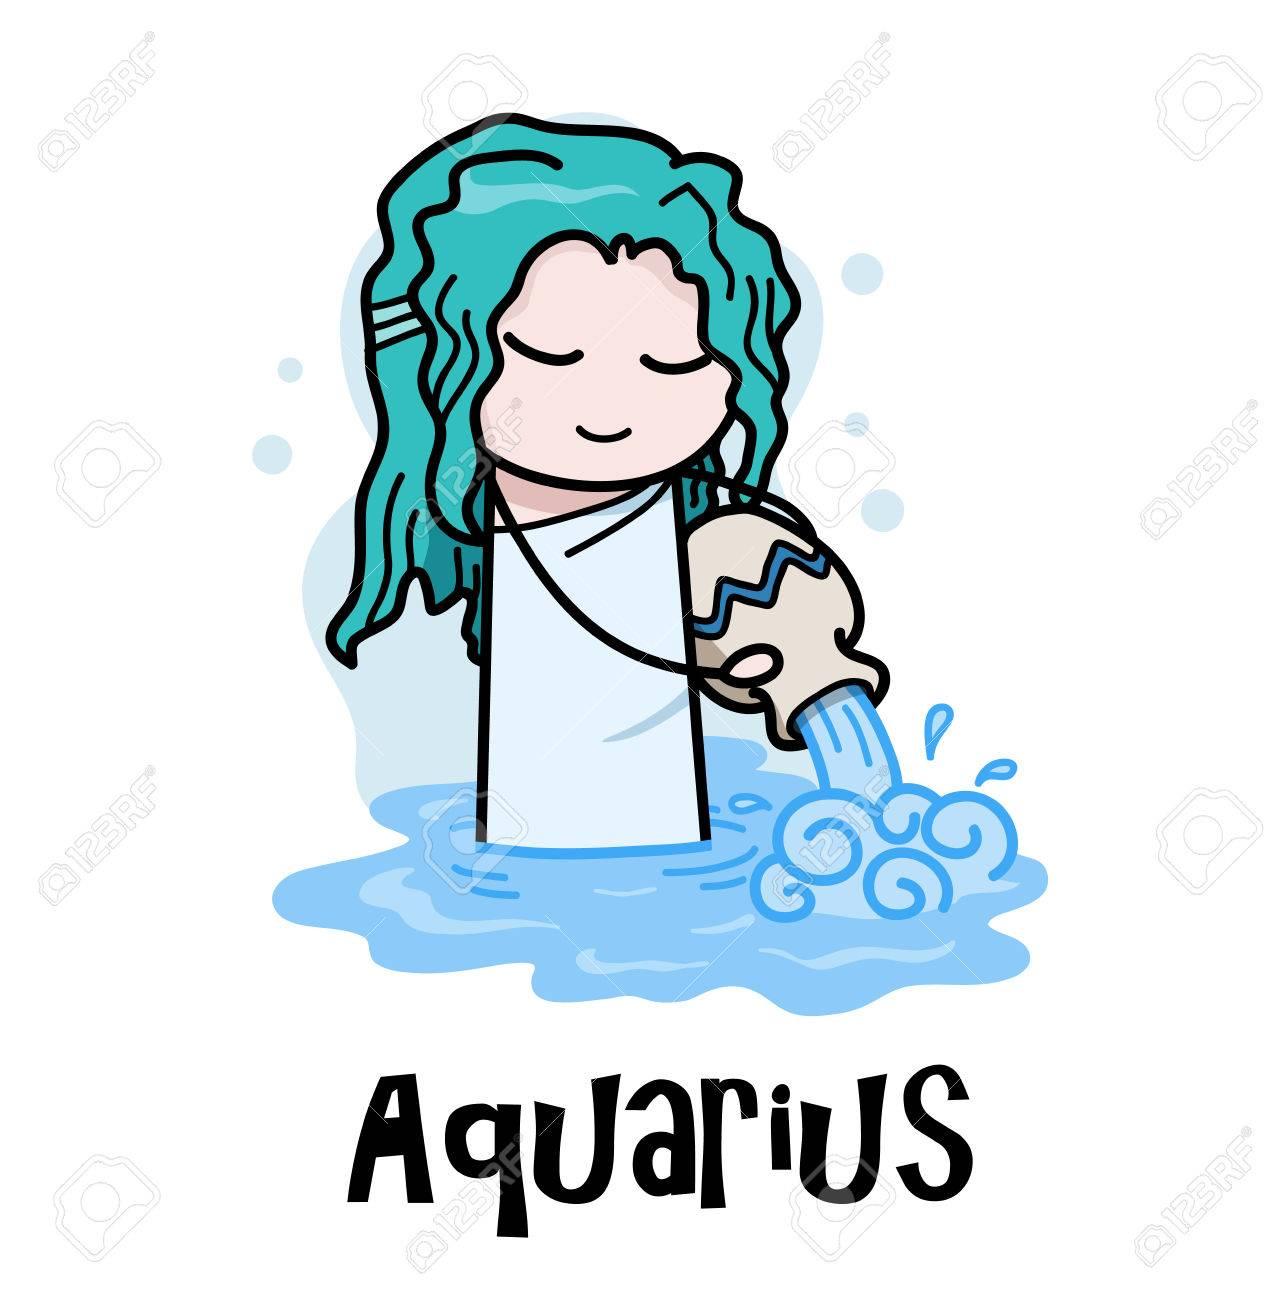 https://previews.123rf.com/images/lemonadeserenade/lemonadeserenade1703/lemonadeserenade170300010/73255655-aquarius-zodiac-a-hand-drawn-vector-cartoon-illustration-of-aquarius-zodiac-the-water-bearer-.jpg